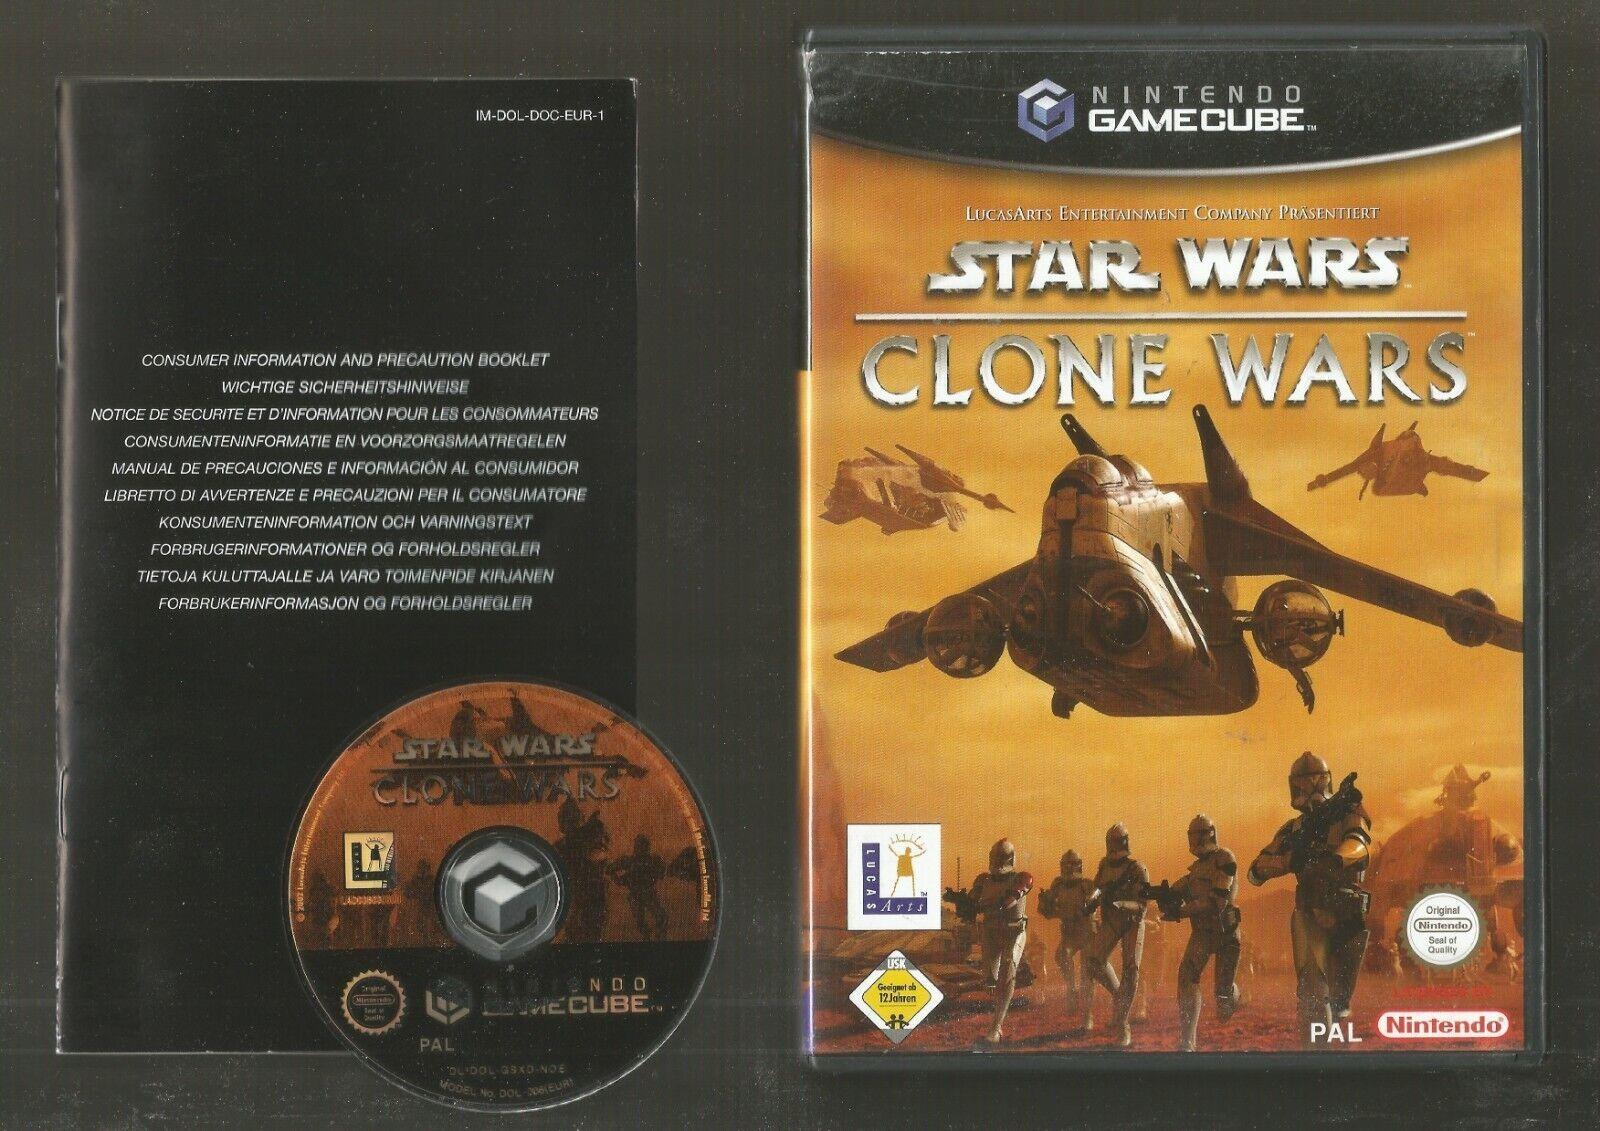 NINTENDO GAMECUBE - STAR WARS CLONE WARS - jeu StarWars